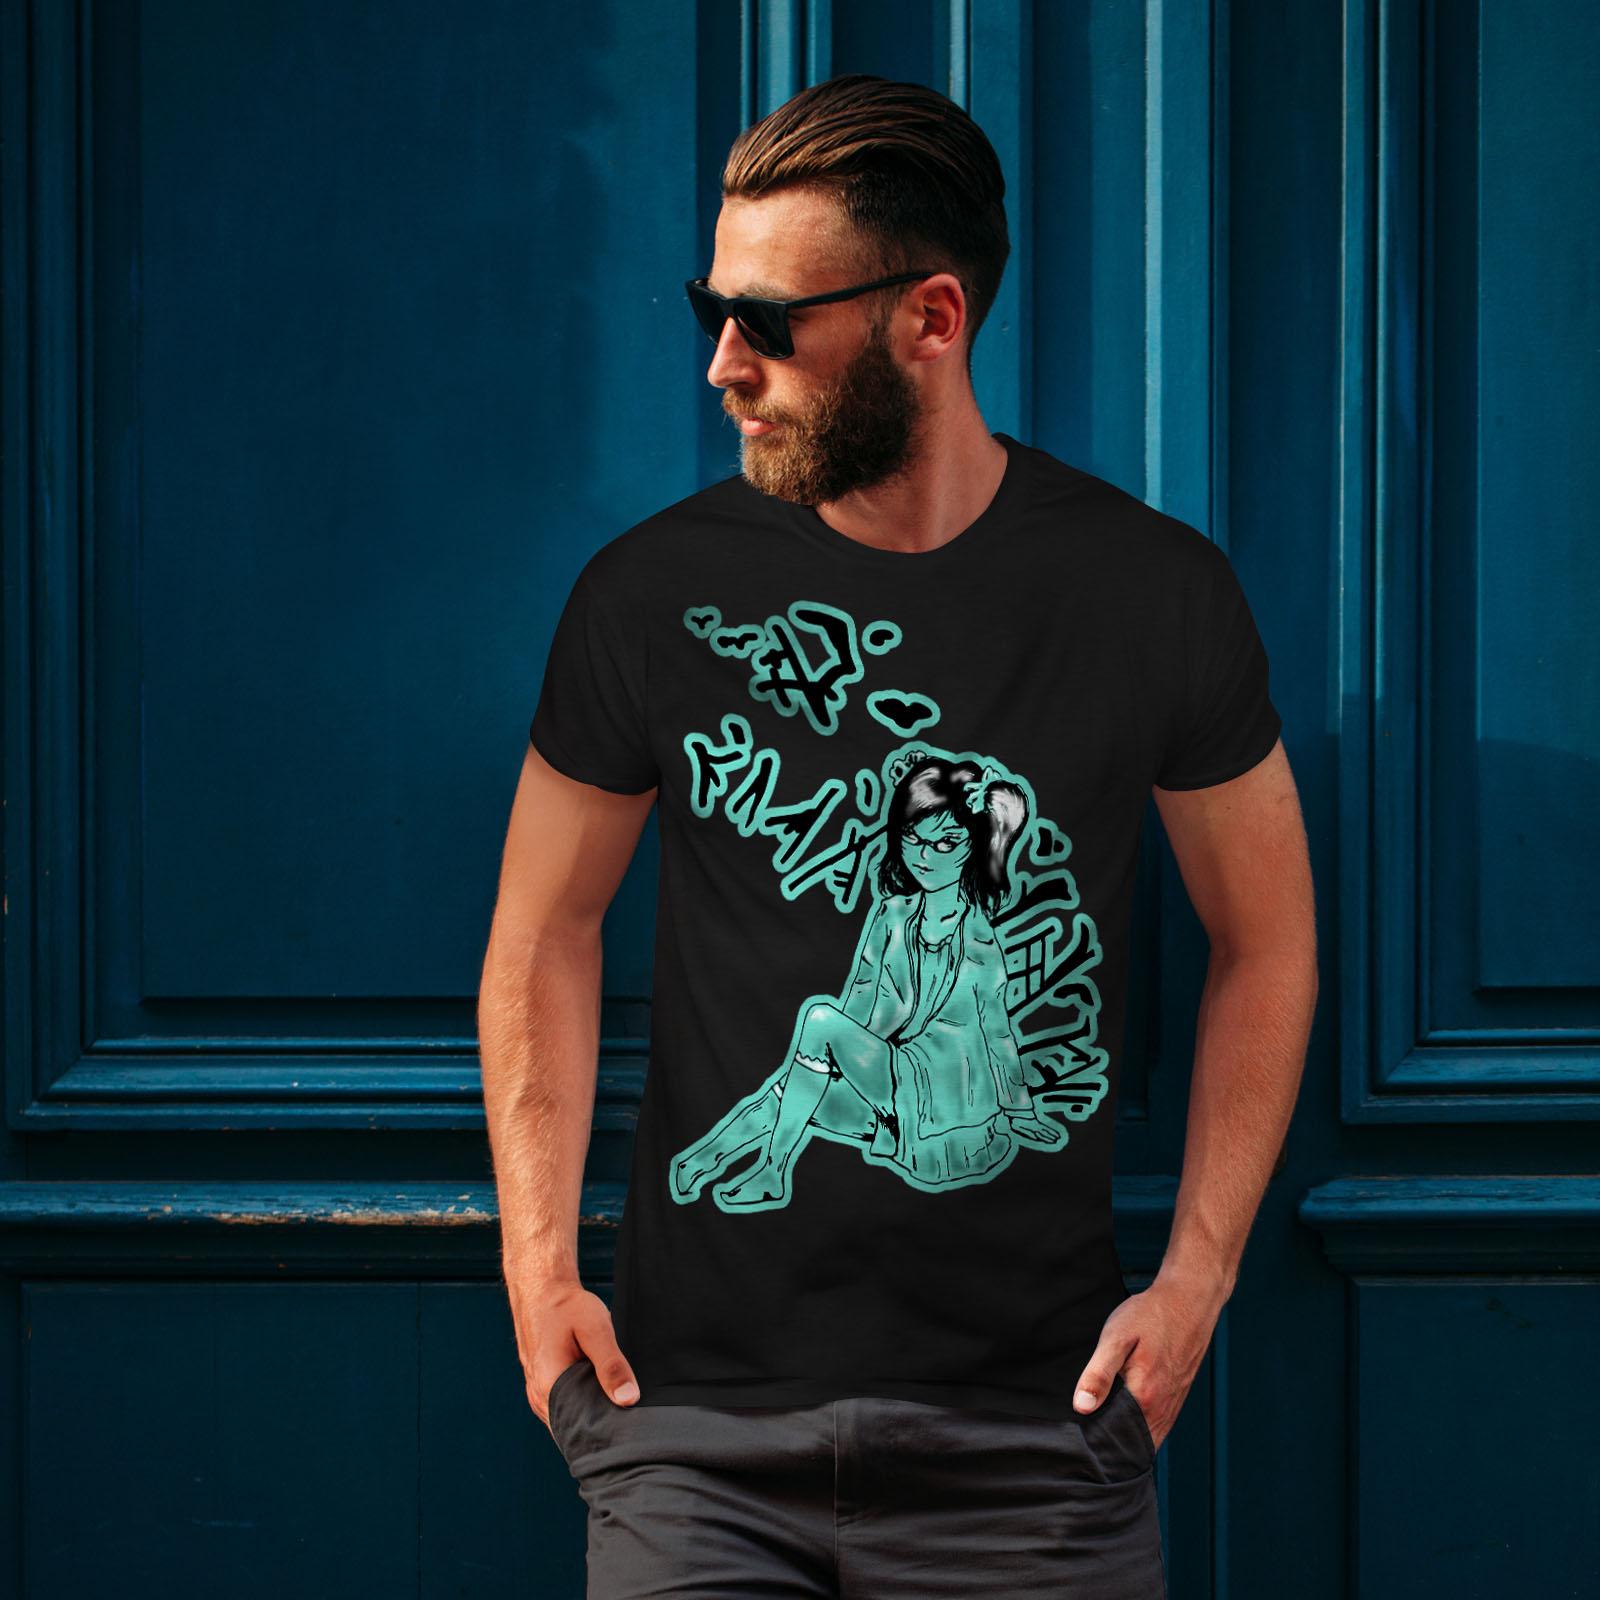 Girl Graphic Design Printed Tee Wellcoda Gothic Asian Lady Mens T-shirt